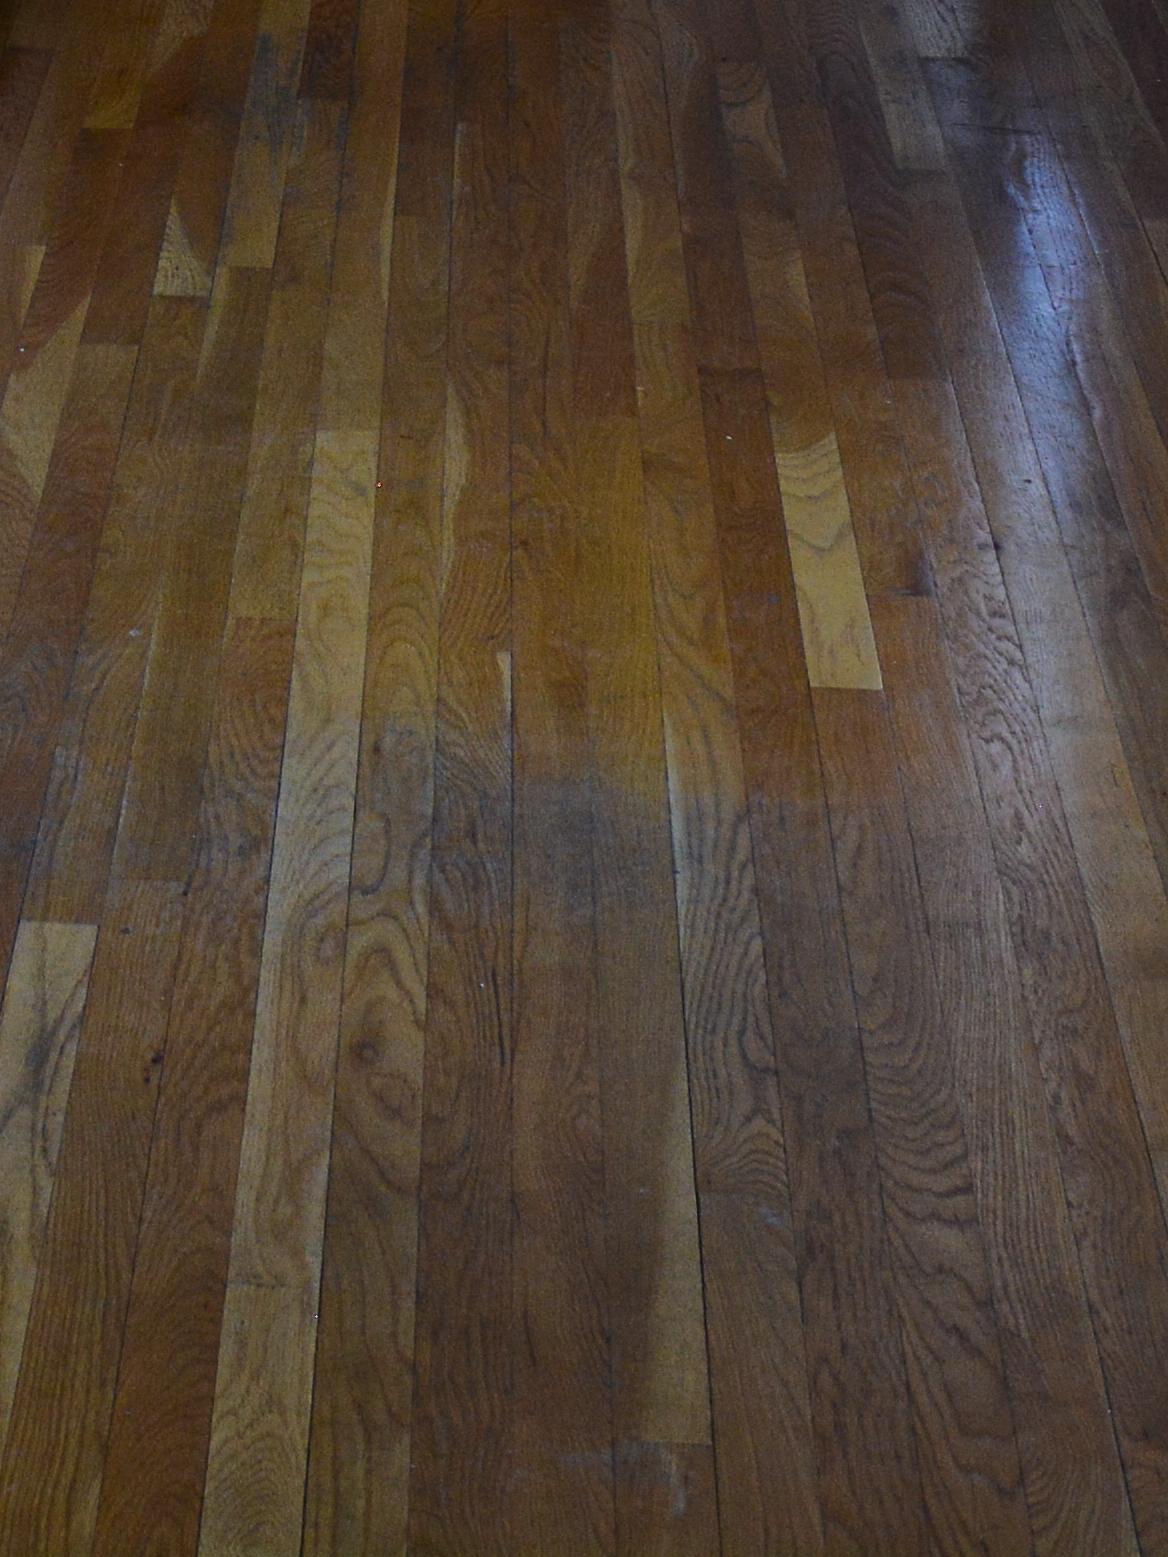 The floors had seen better days.